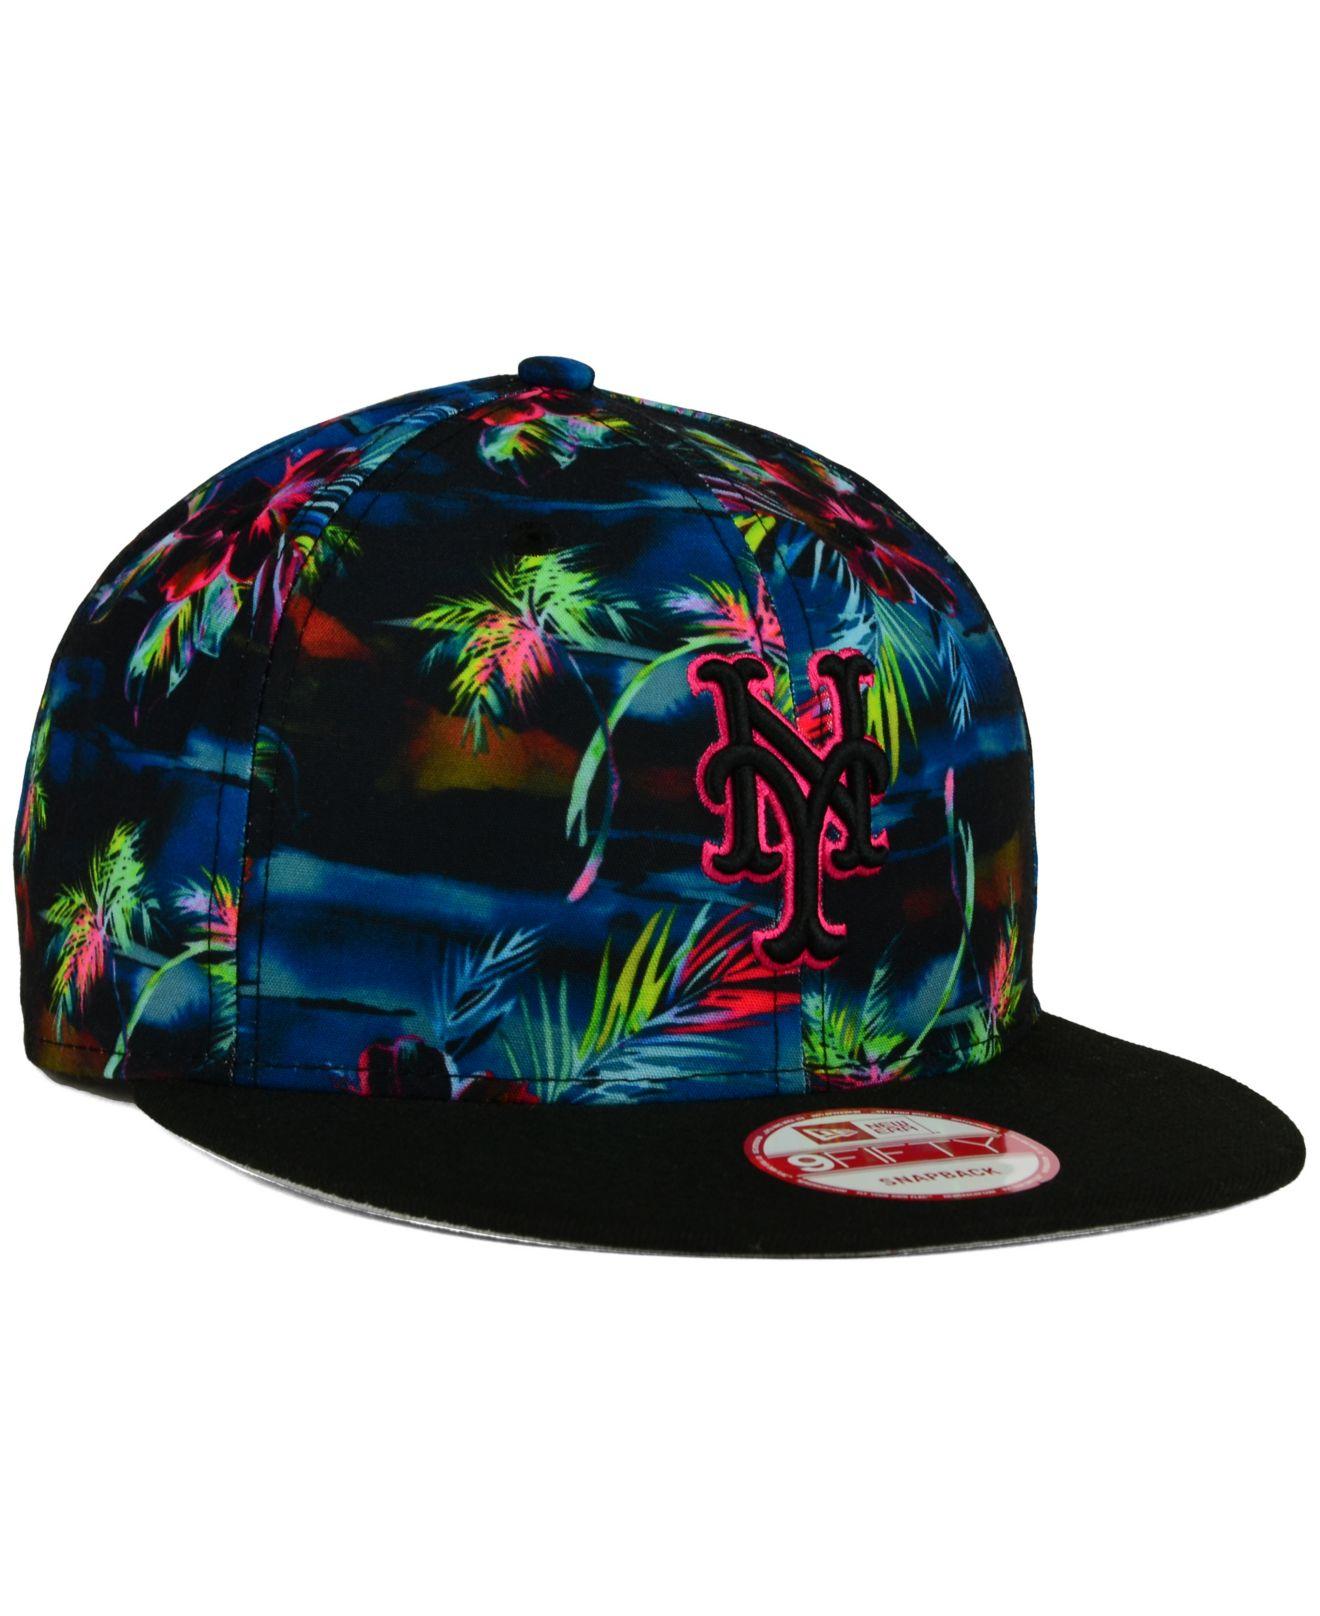 cheap for discount 8260e 3a497 ... wholesale lyst ktz new york mets dark tropic 9fifty snapback cap for  men 19e6a 33cb1